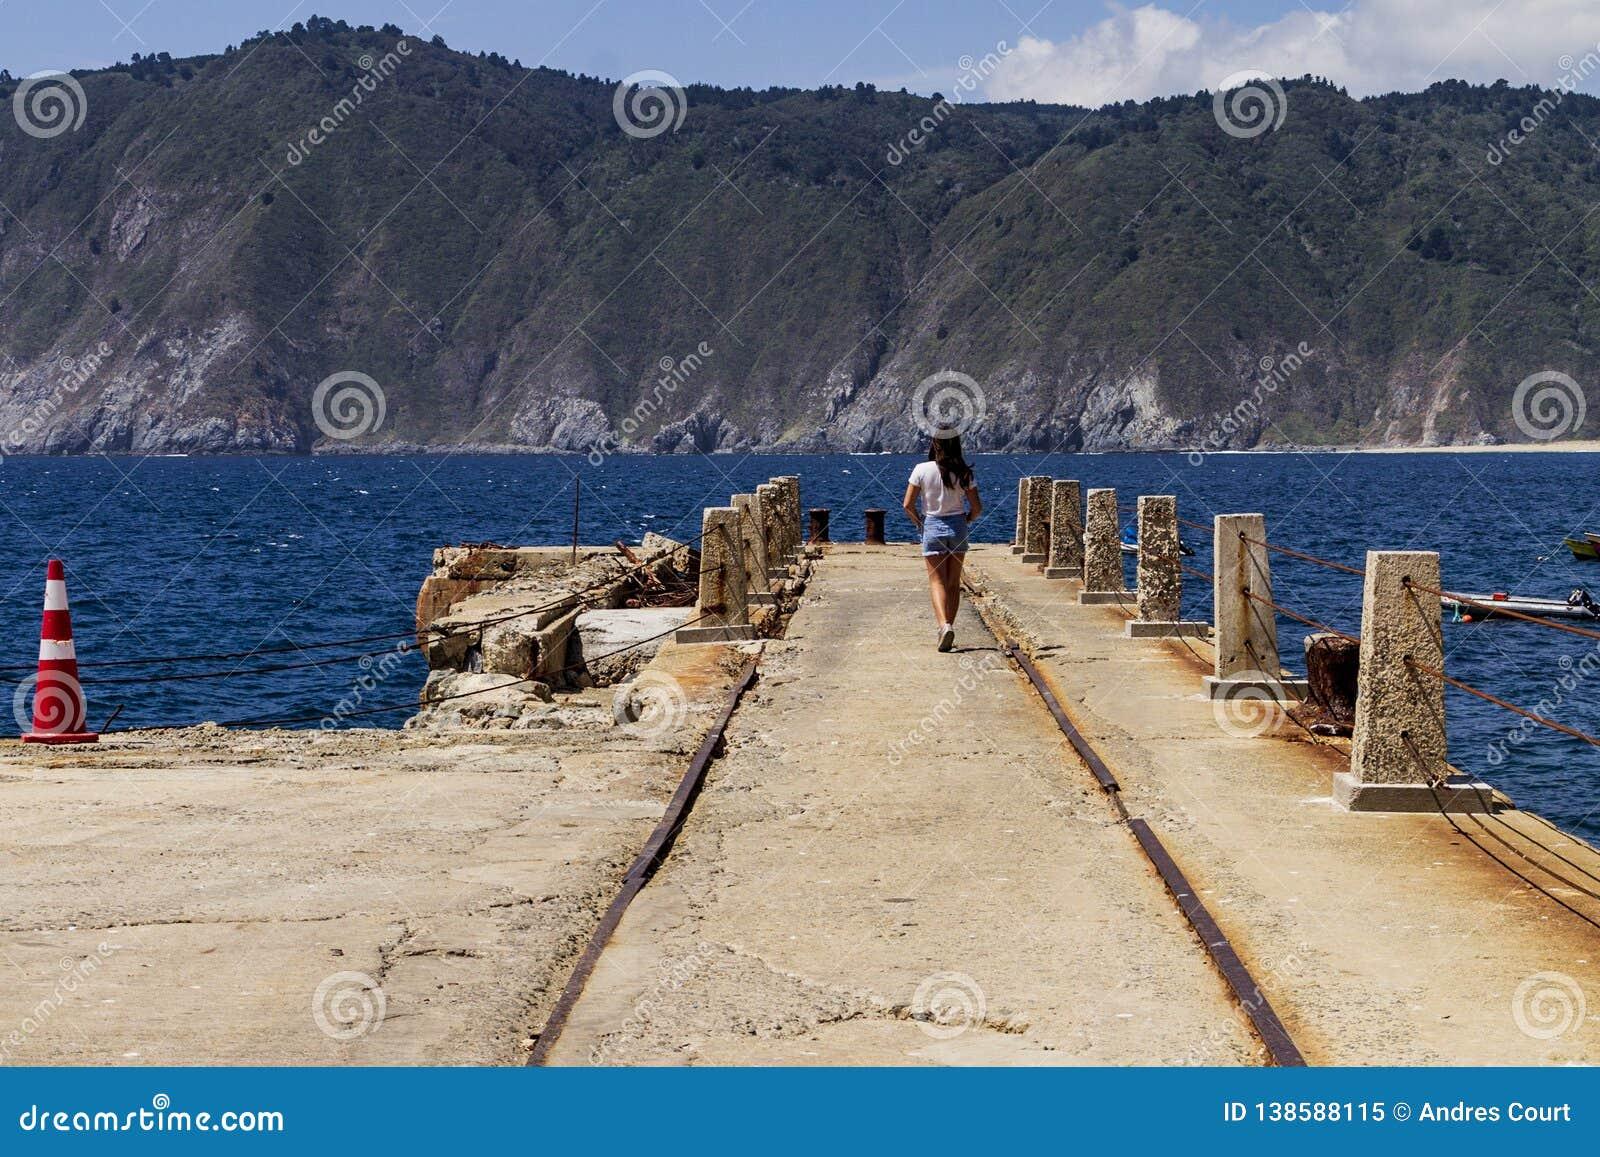 Young girl walking in pier